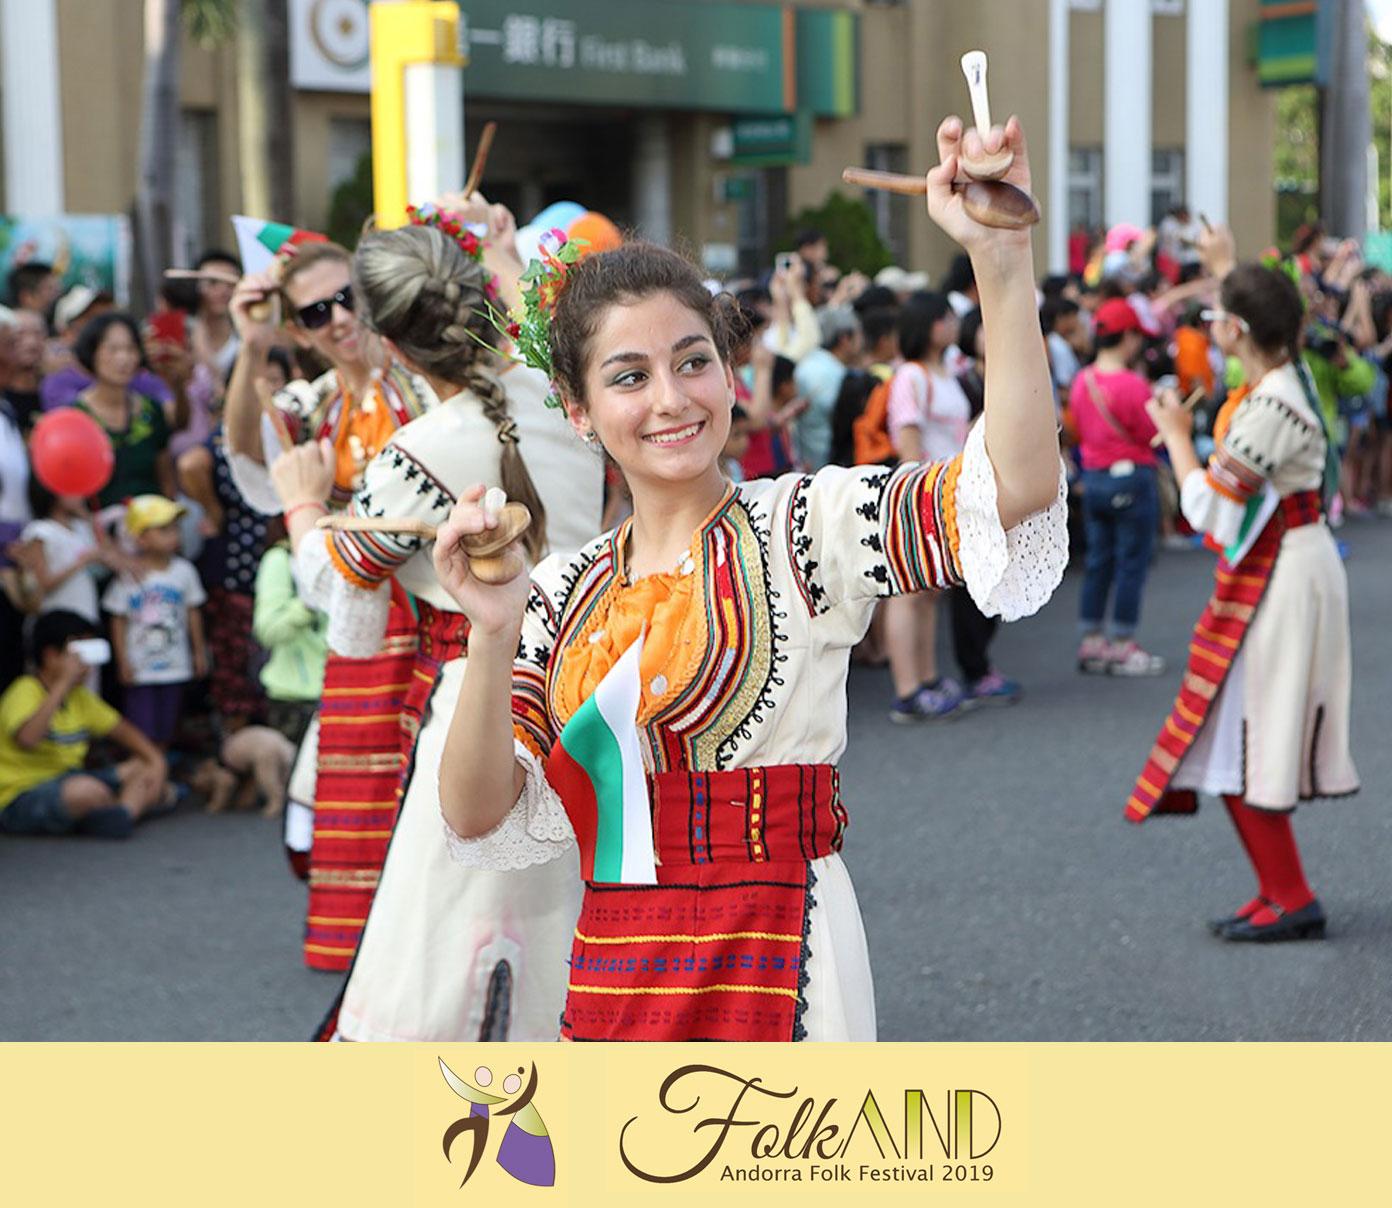 FolkAND: Andorra Folk Festival